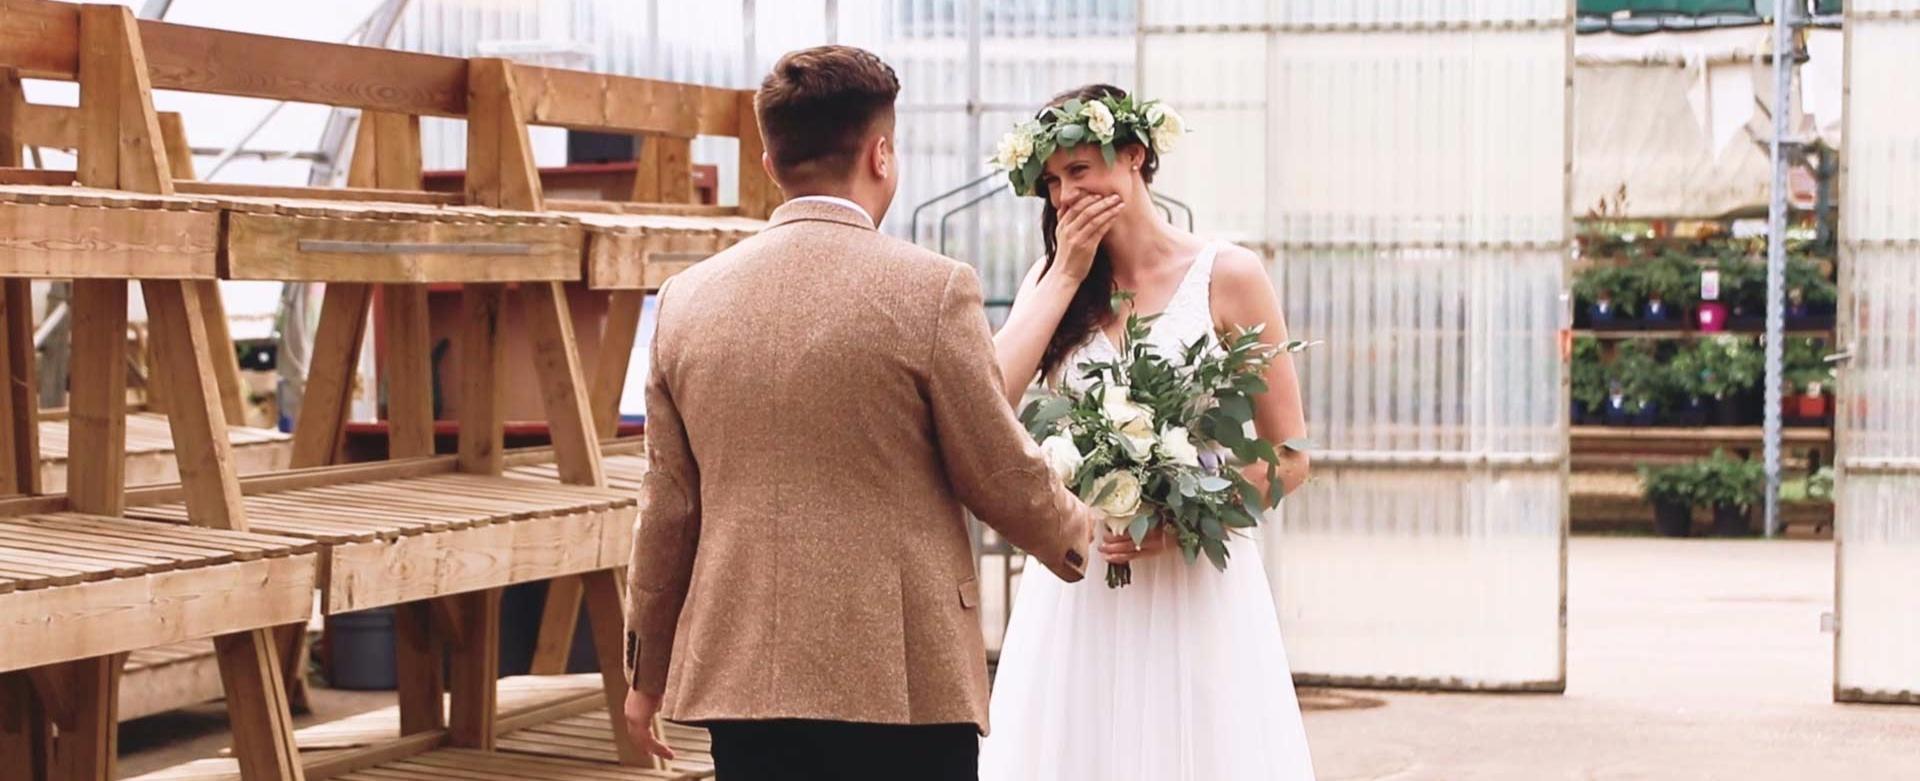 wedding first look in a greenhouse in Edmonton, Alberta